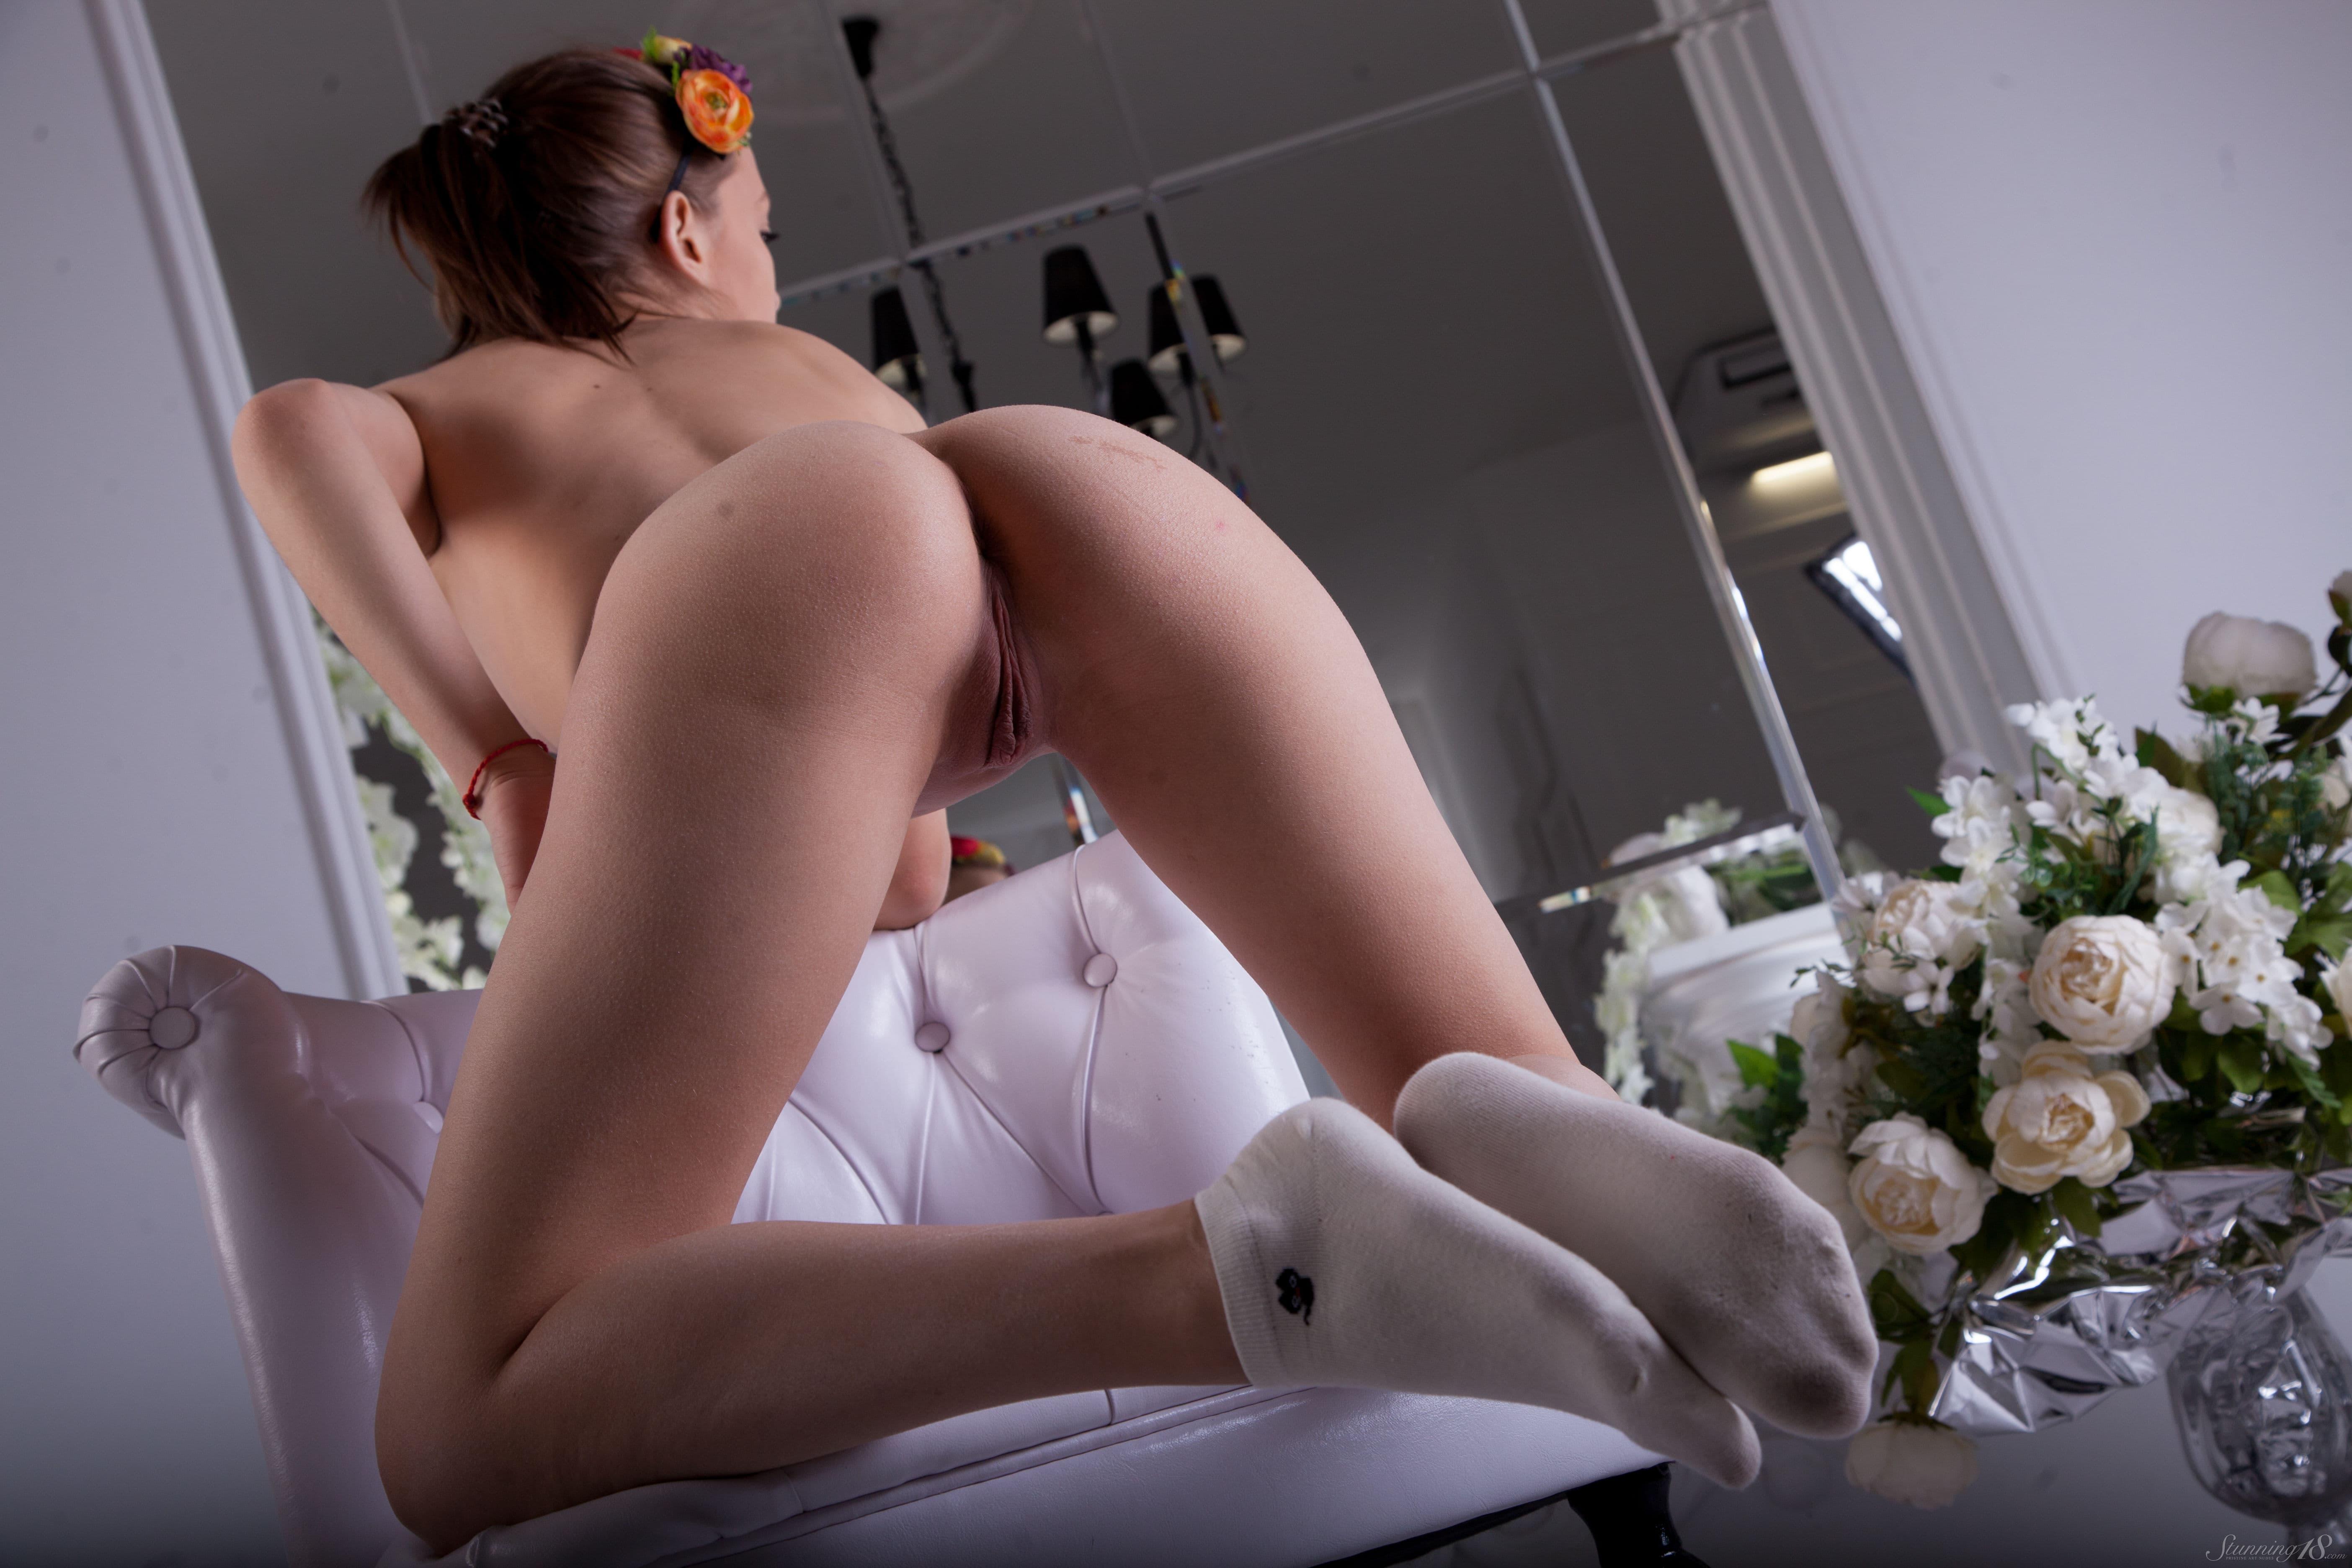 socks-fetish-nude-girls-pussies-mix-vol5-95